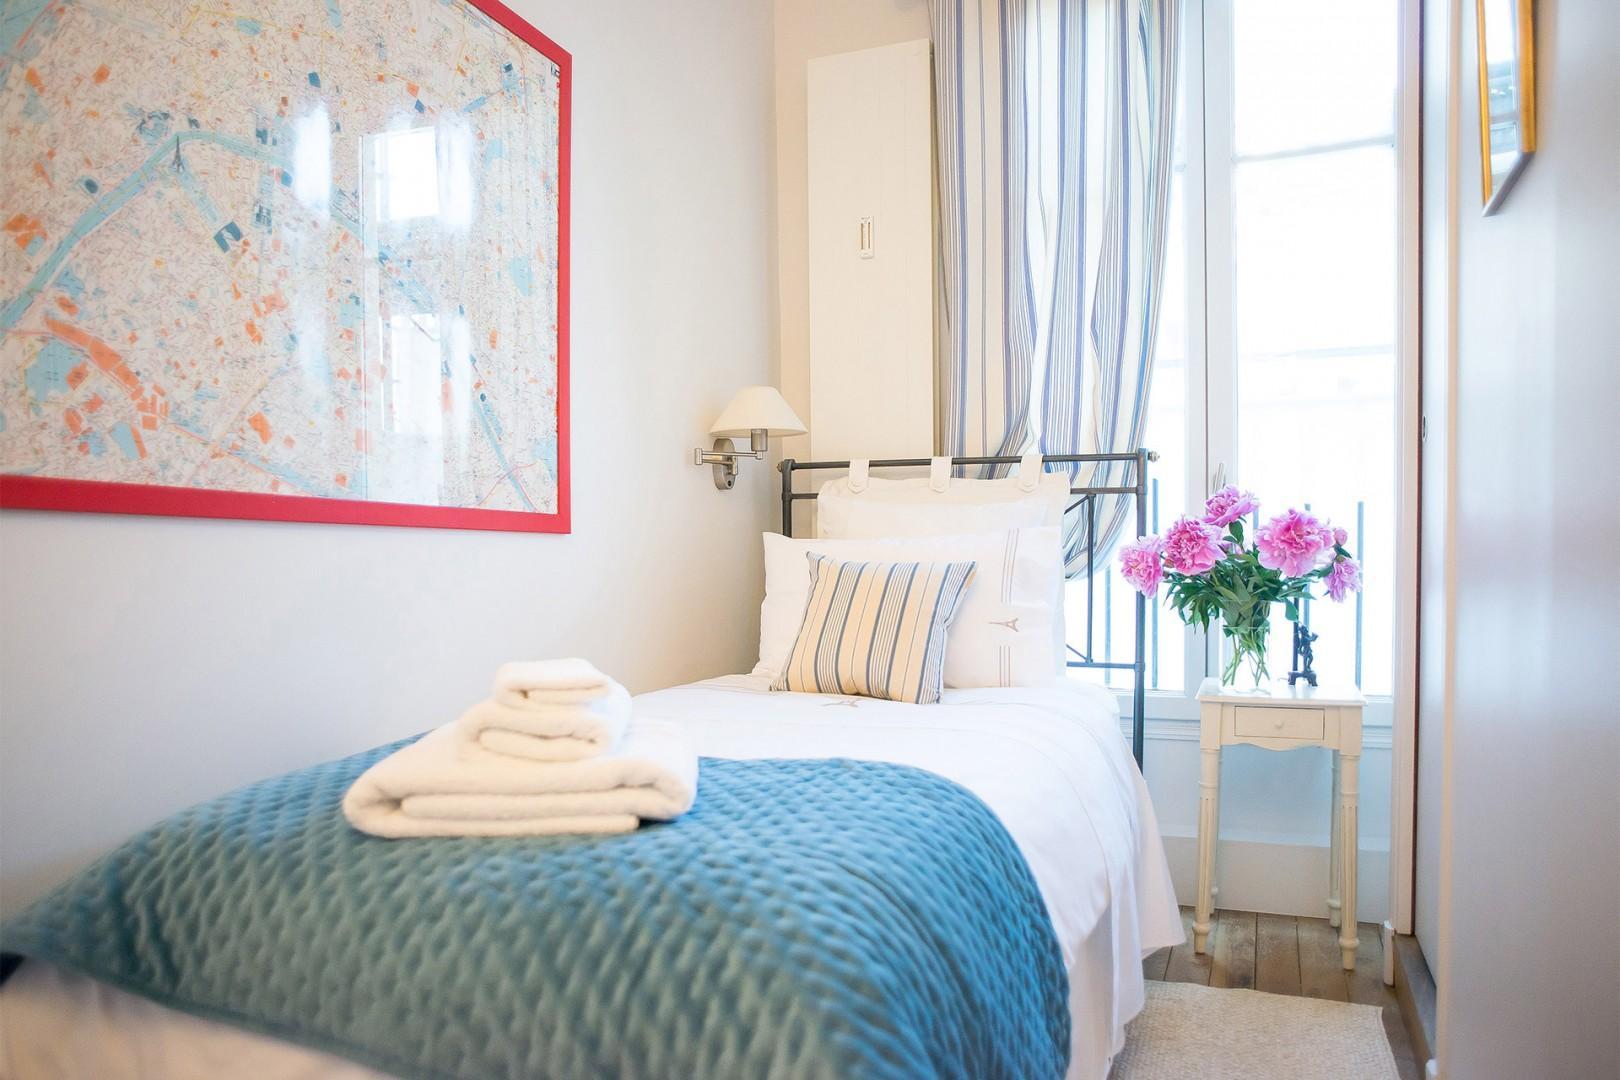 Bedroom 3 sleeps one person and has a private, en suite bathroom.